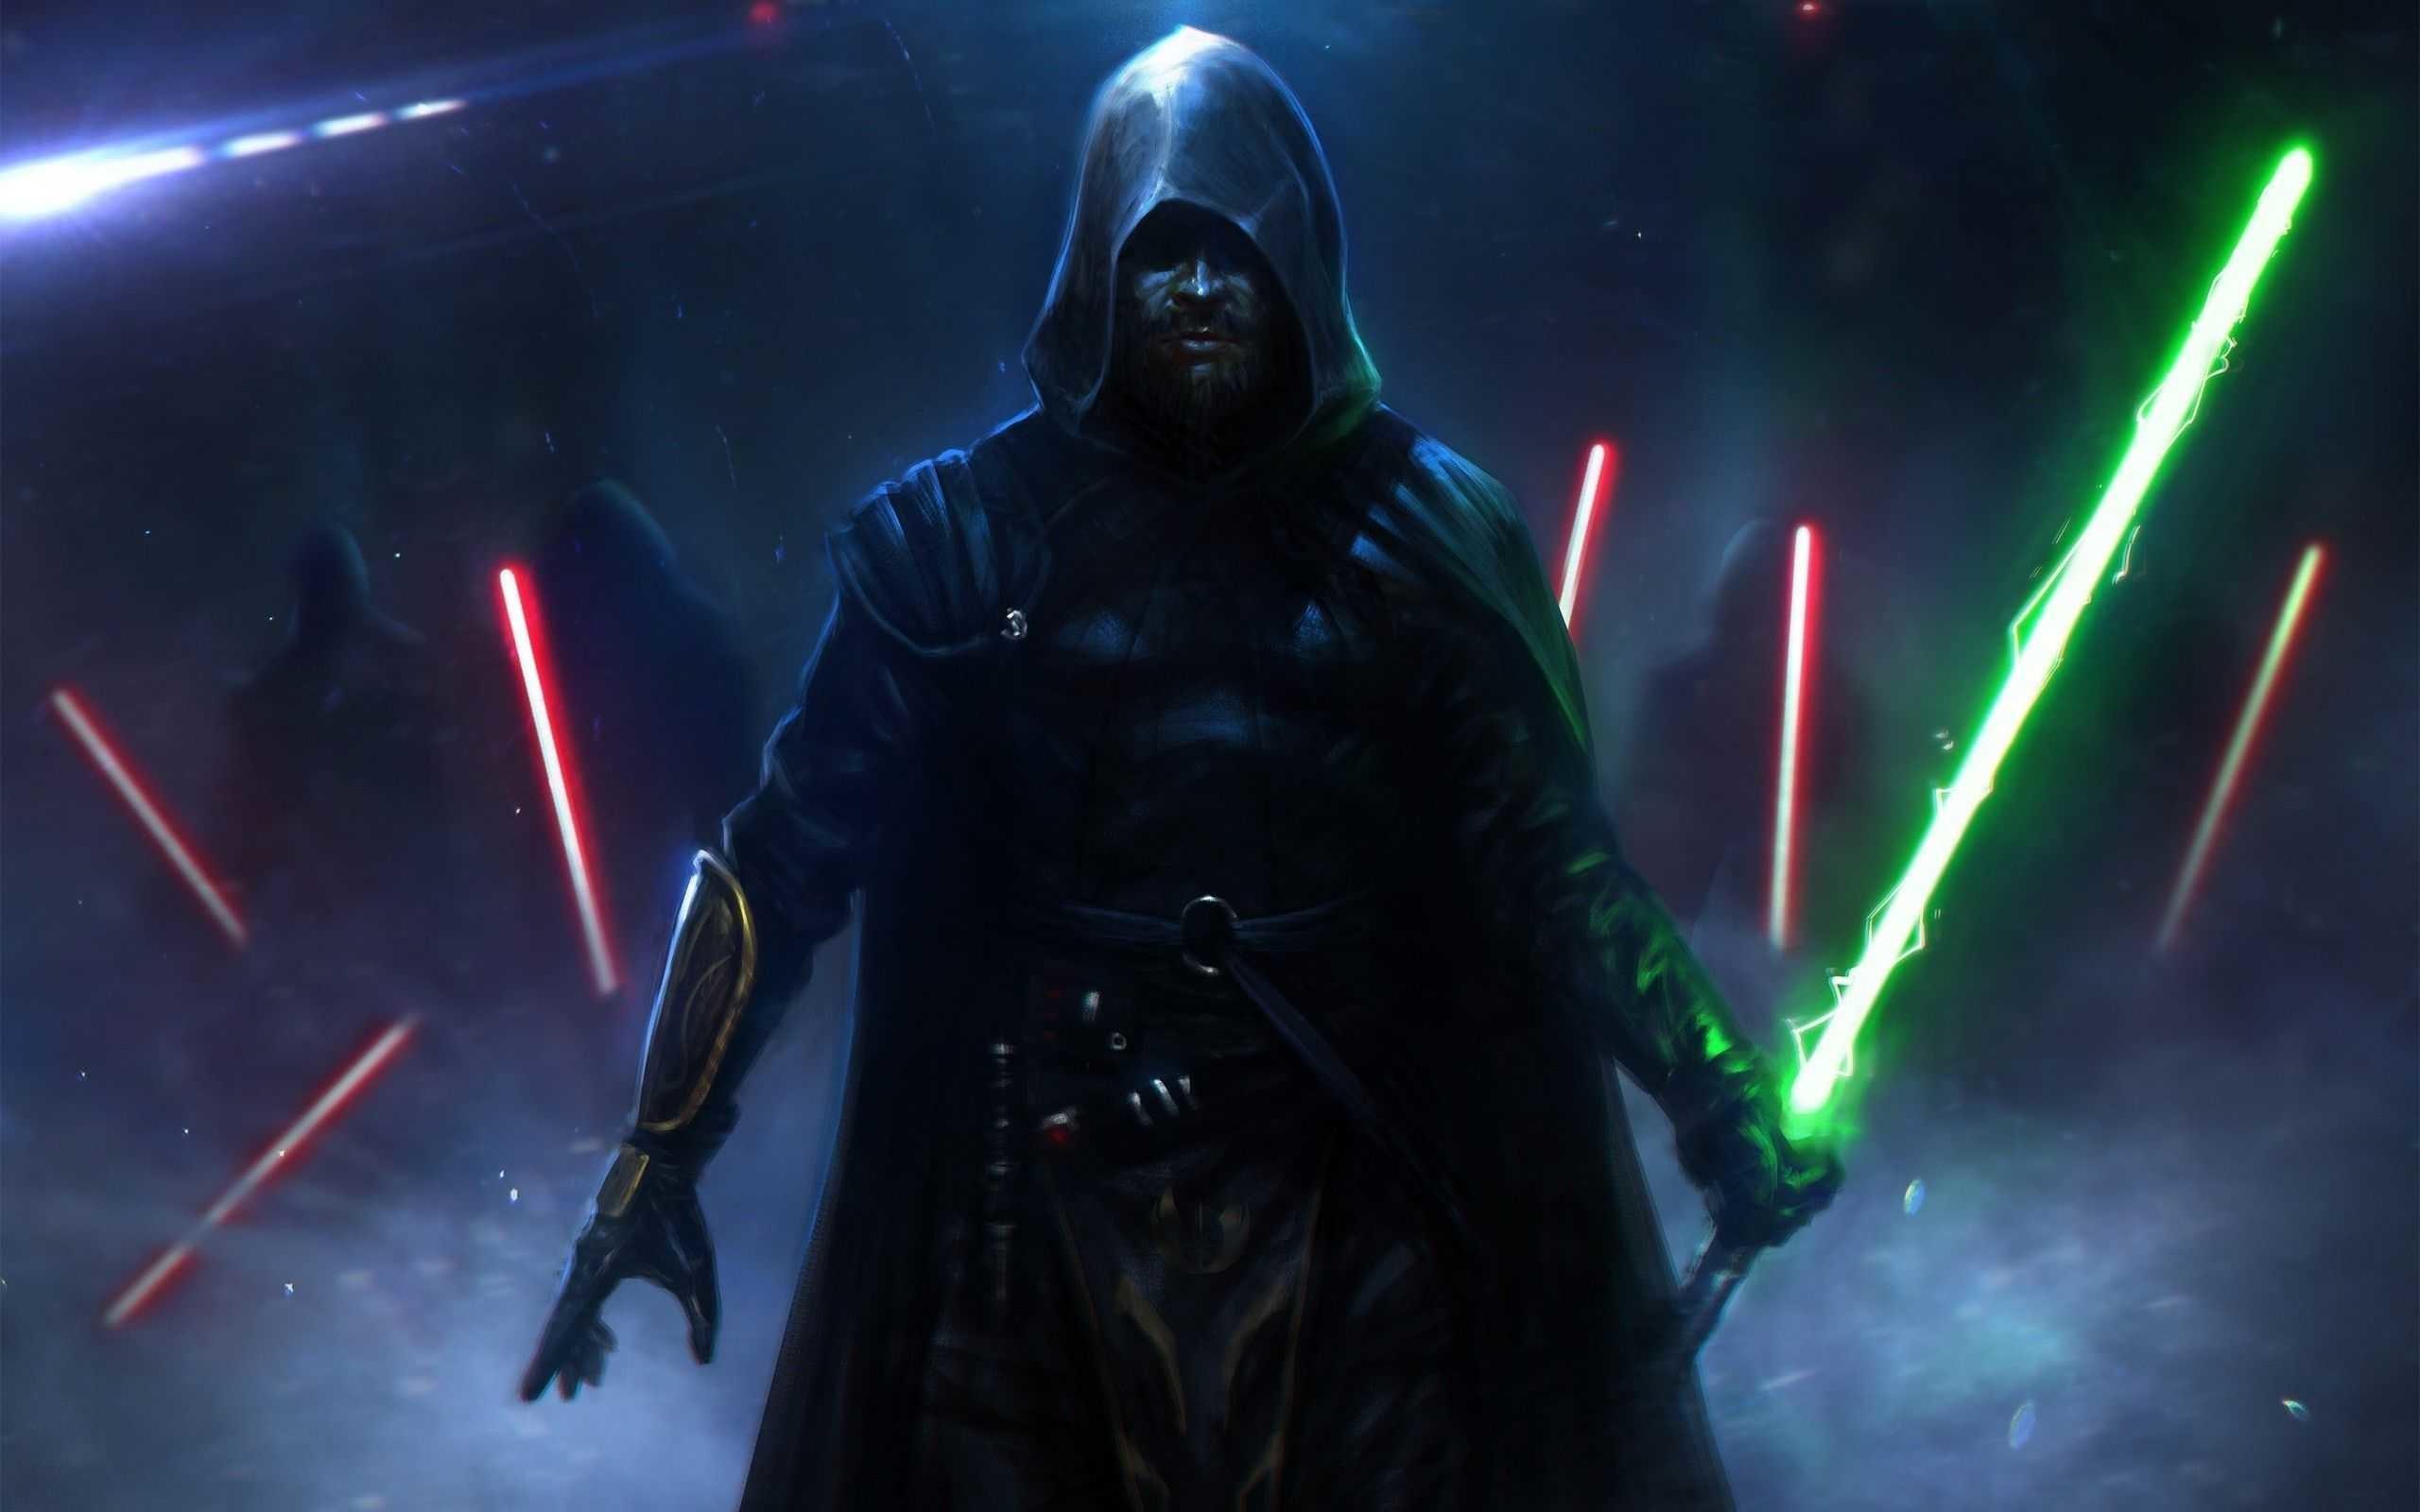 star wars jedi wallpaper hd – https://hdwallpaper.info/star-